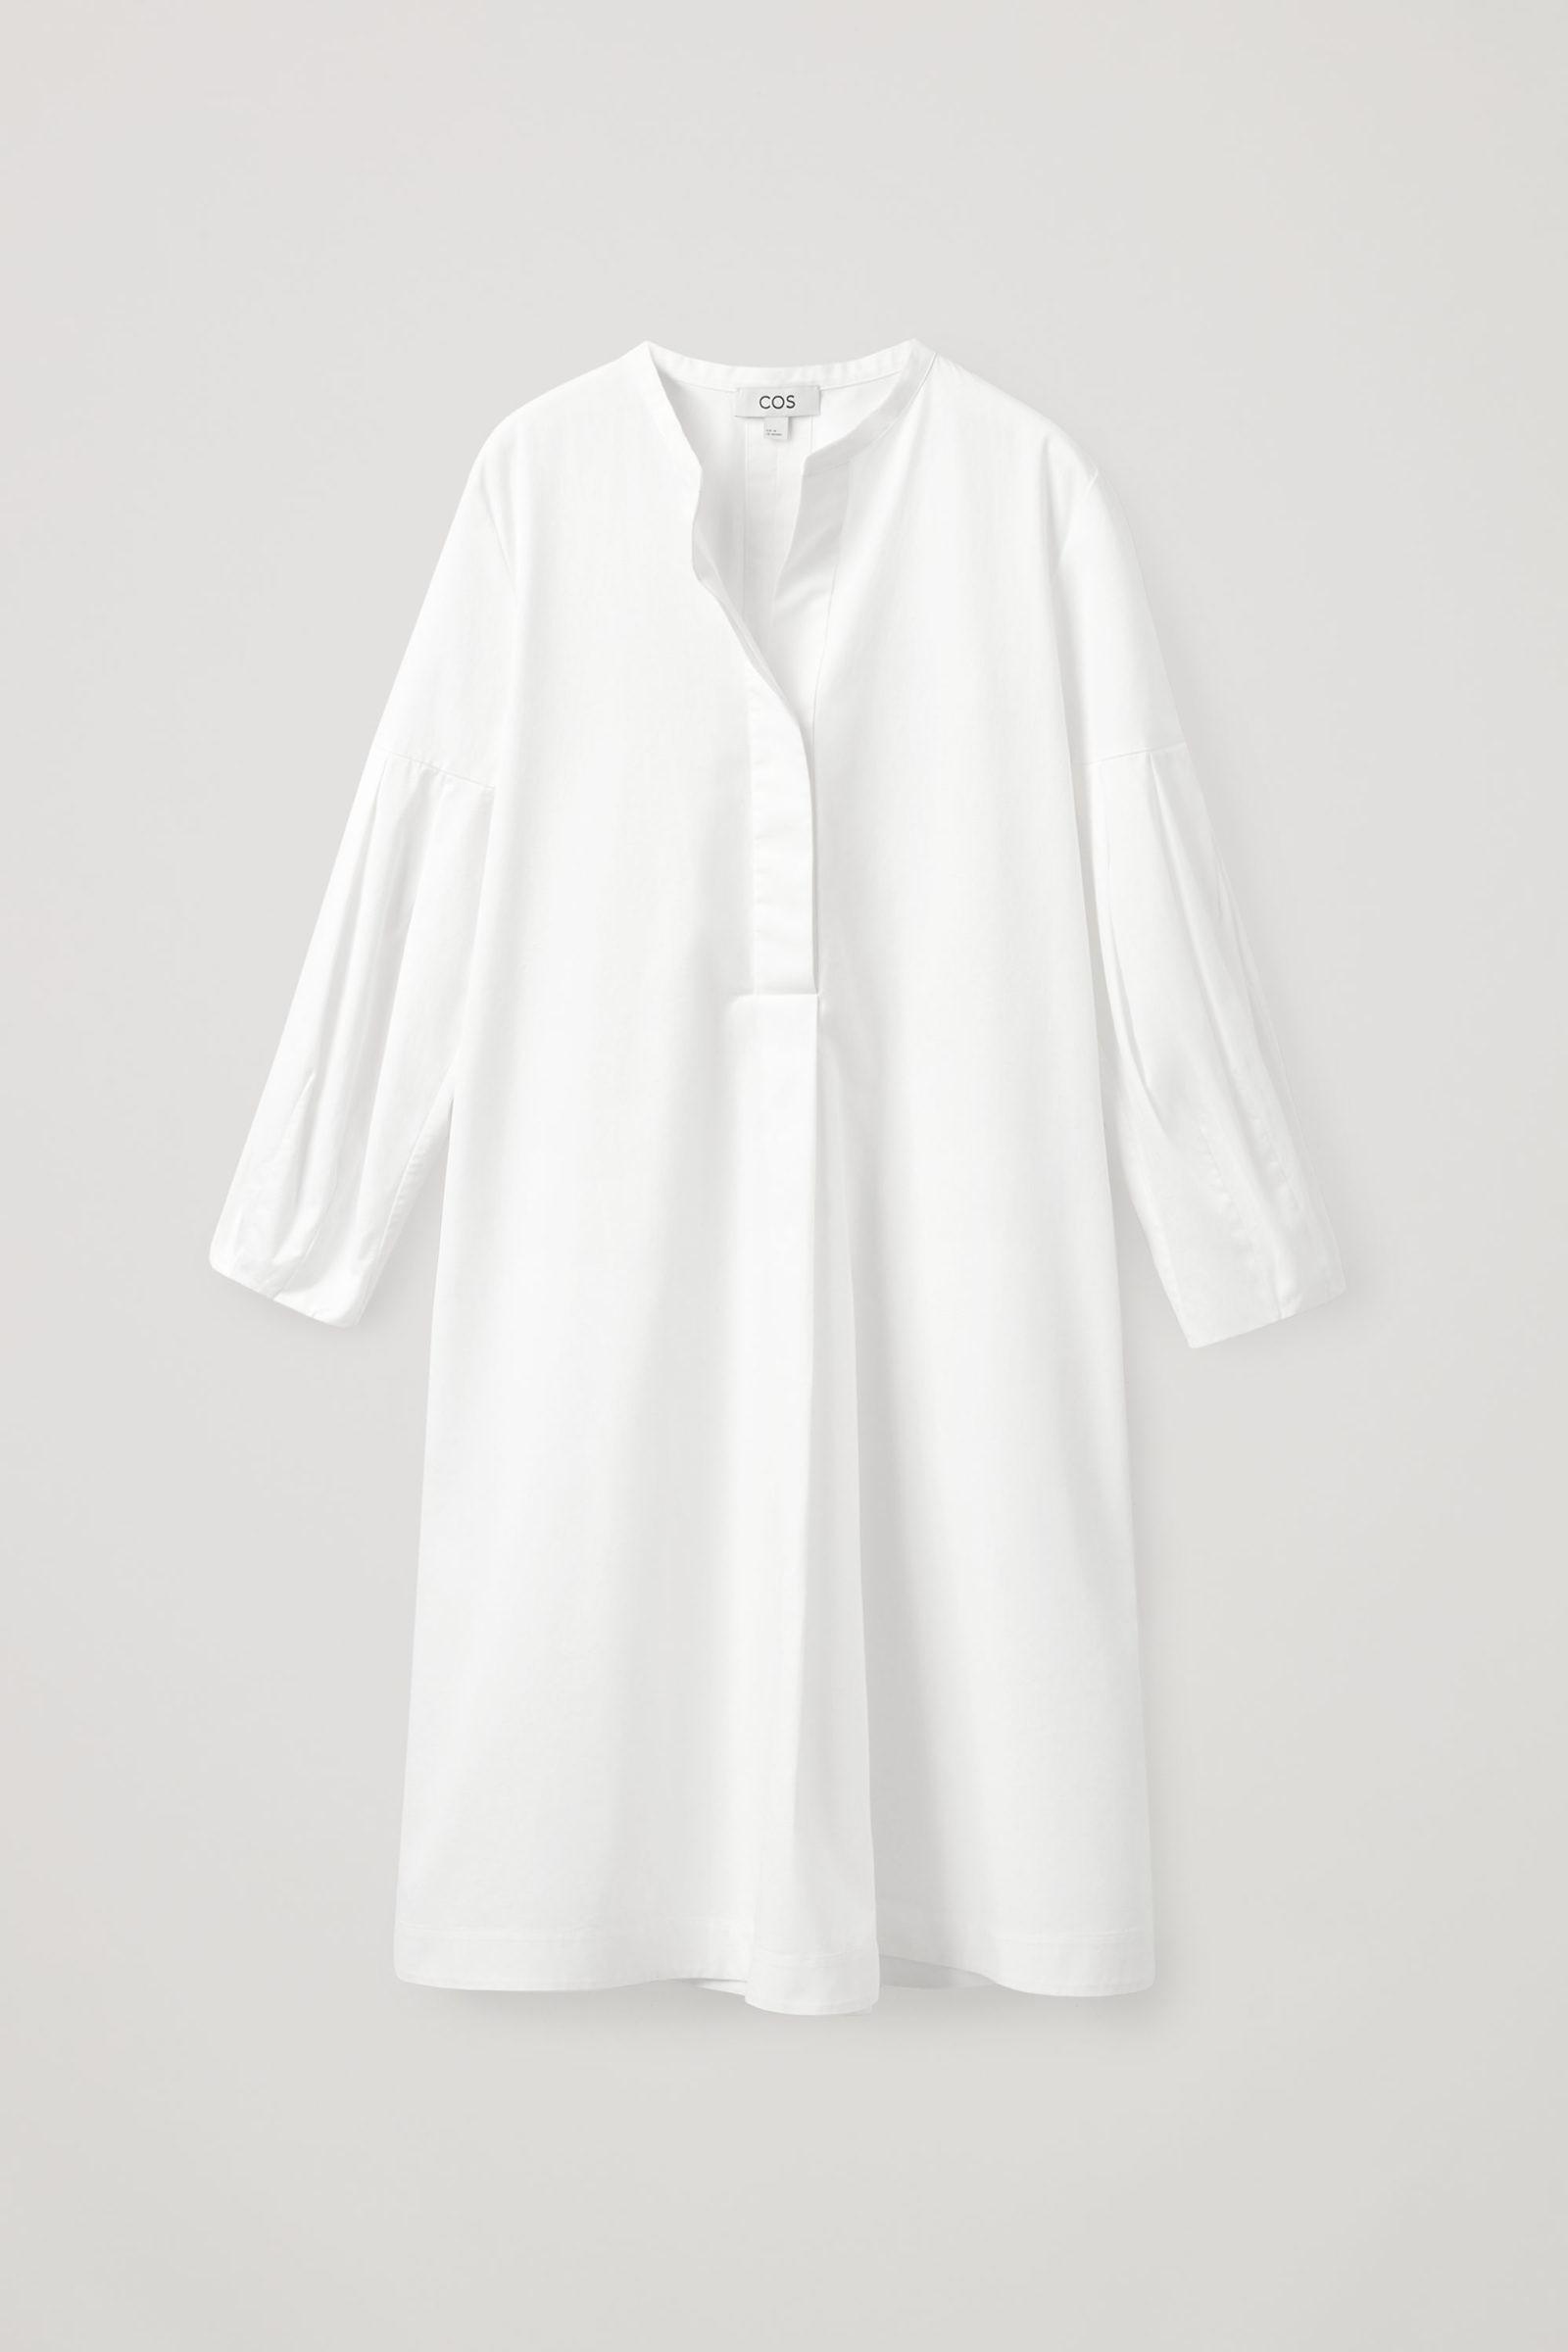 COS 플리티드 셔츠 드레스의 화이트컬러 Product입니다.